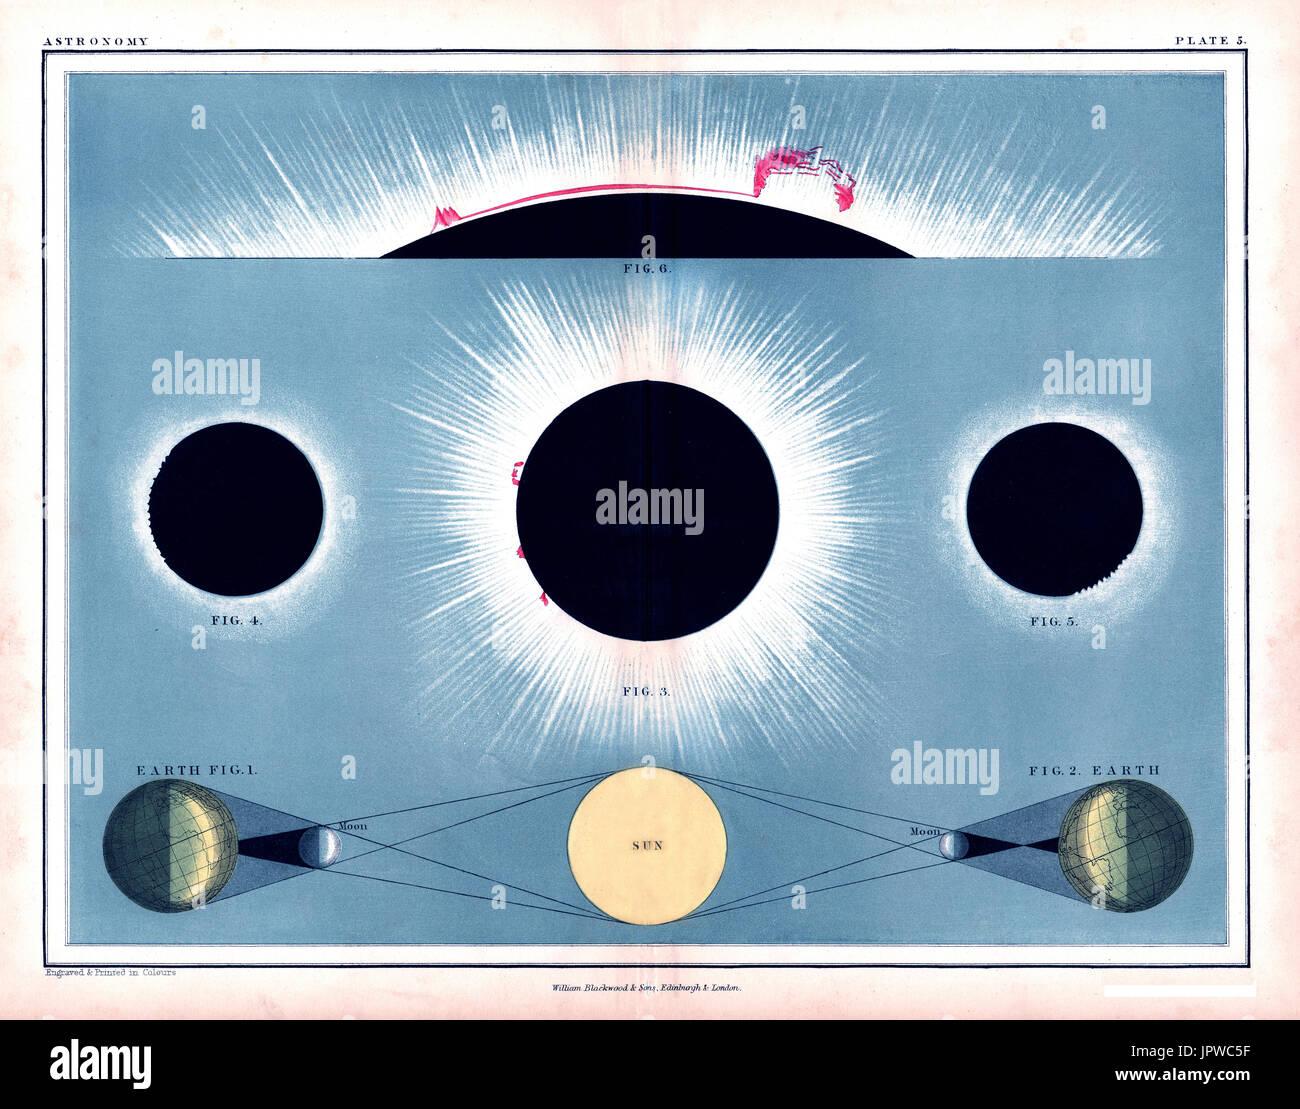 Solar System Diagram Stock Photos & Solar System Diagram Stock ...